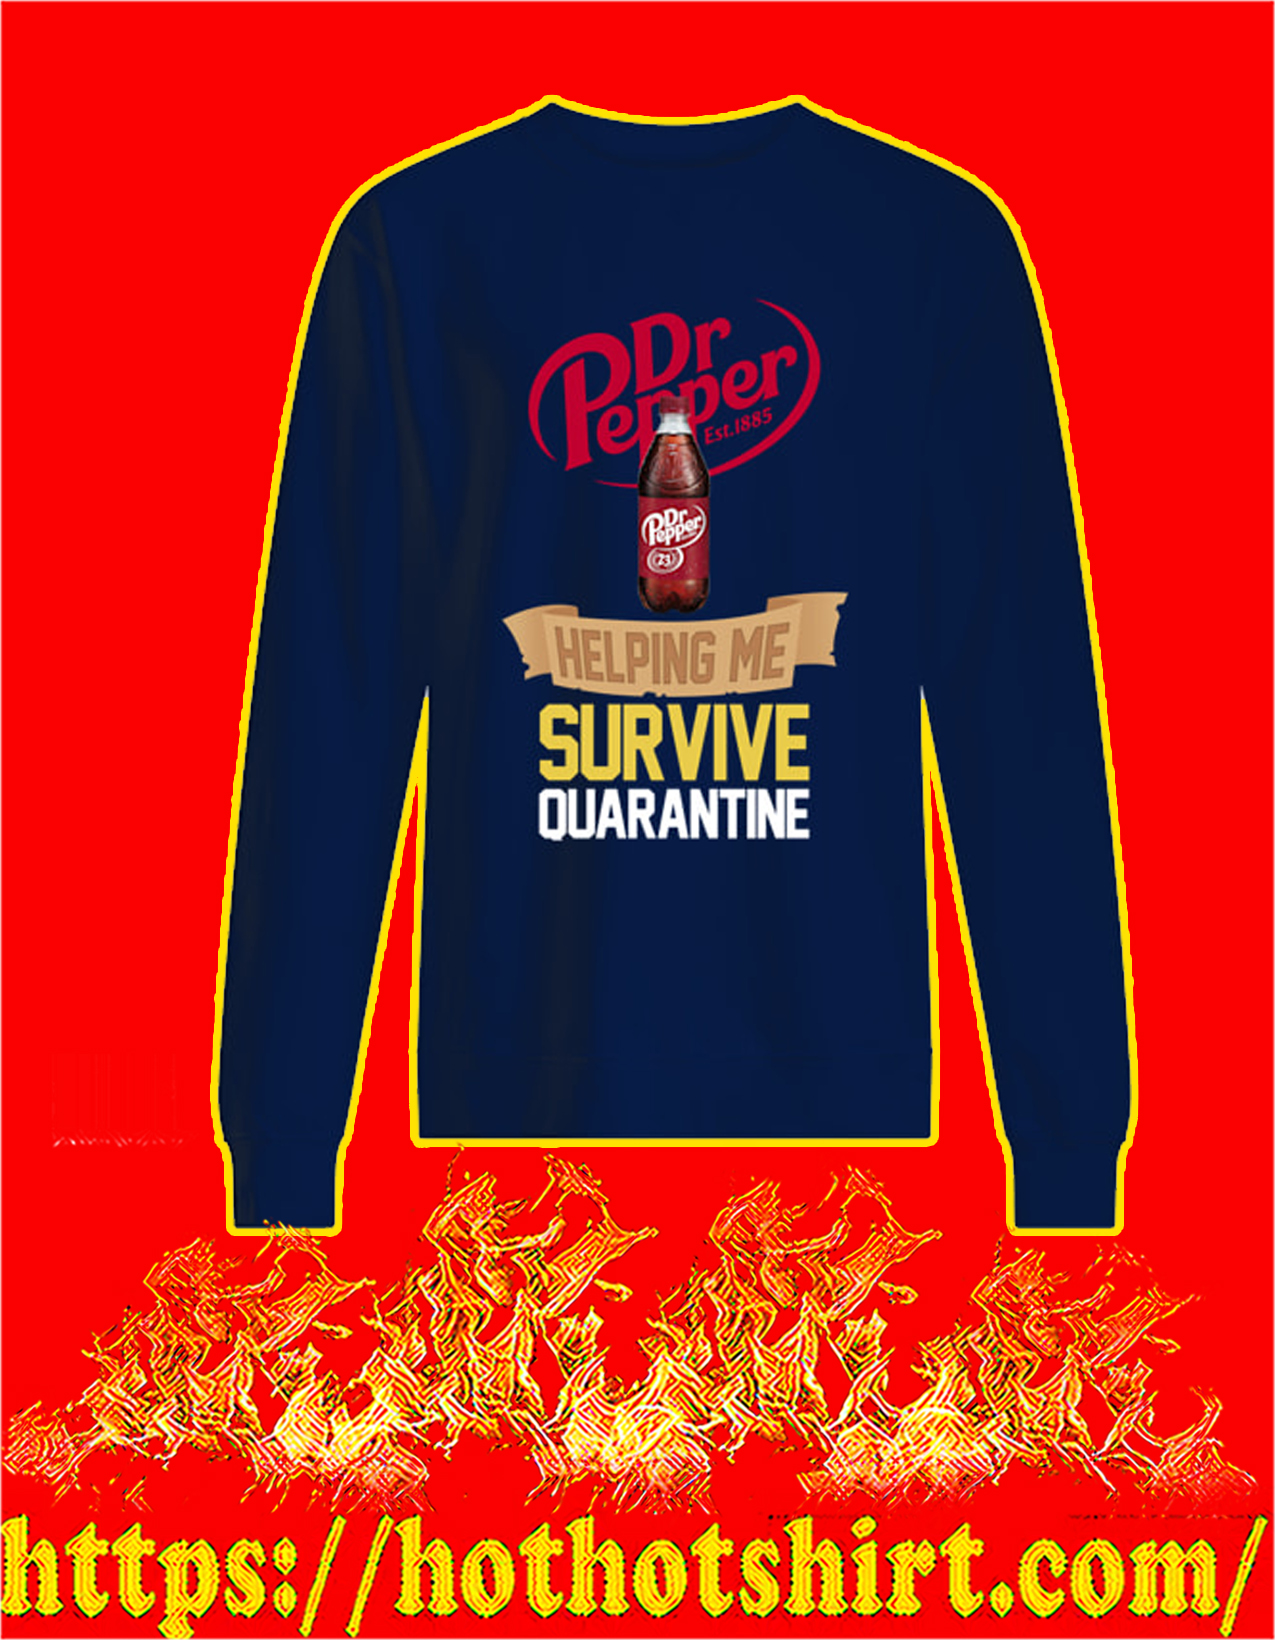 Dr Pepper Helping Me Survive Quarantine Sweatshirt